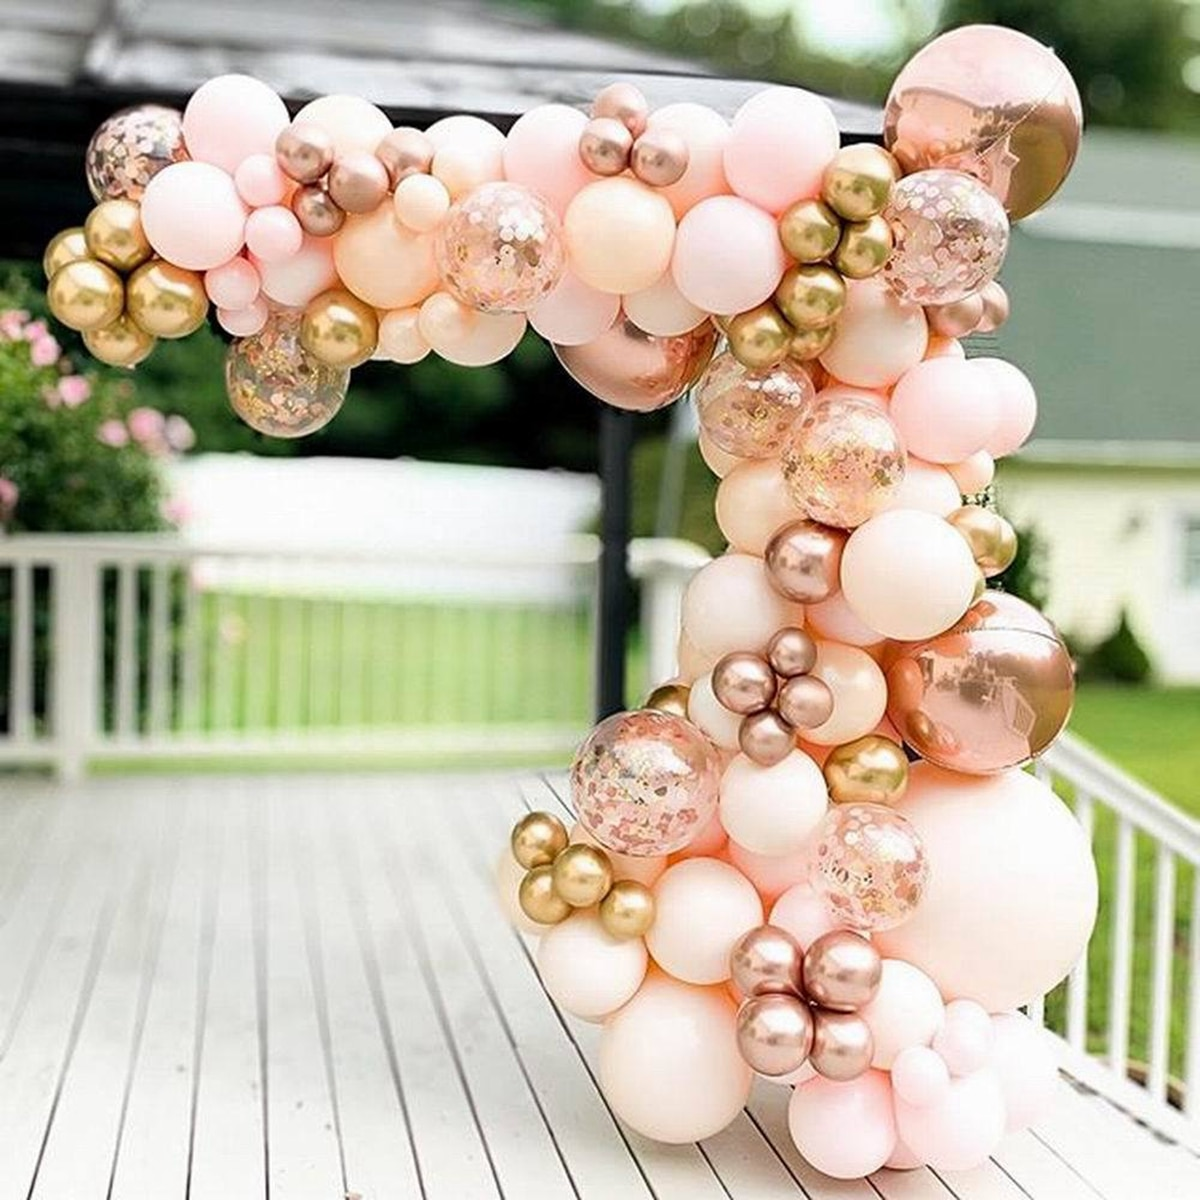 Macaron Peach Pink Balloon Garland Arch Kit Wedding Birthday Party Decoration Kids Globos Rose Gold Confetti Latex Ballon